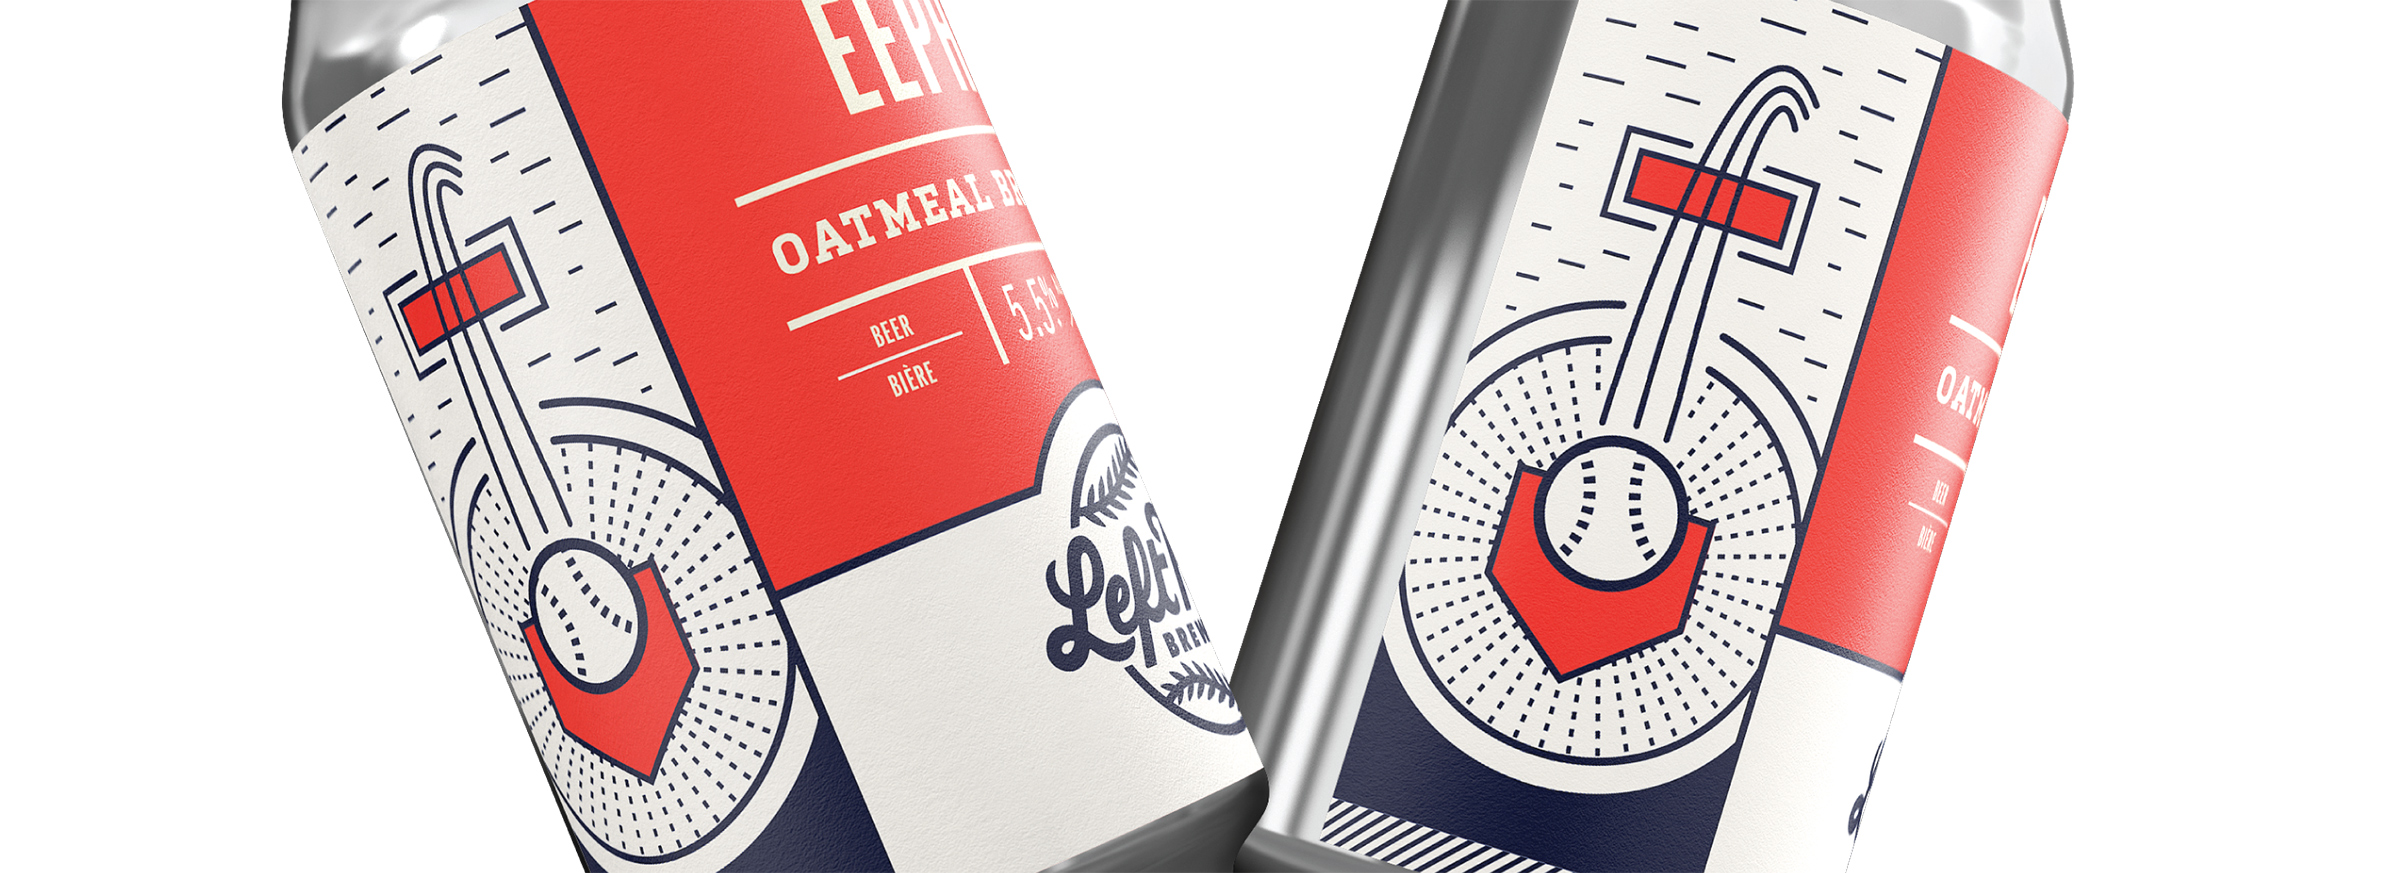 CODO Design - Left Field Brewery11.jpg